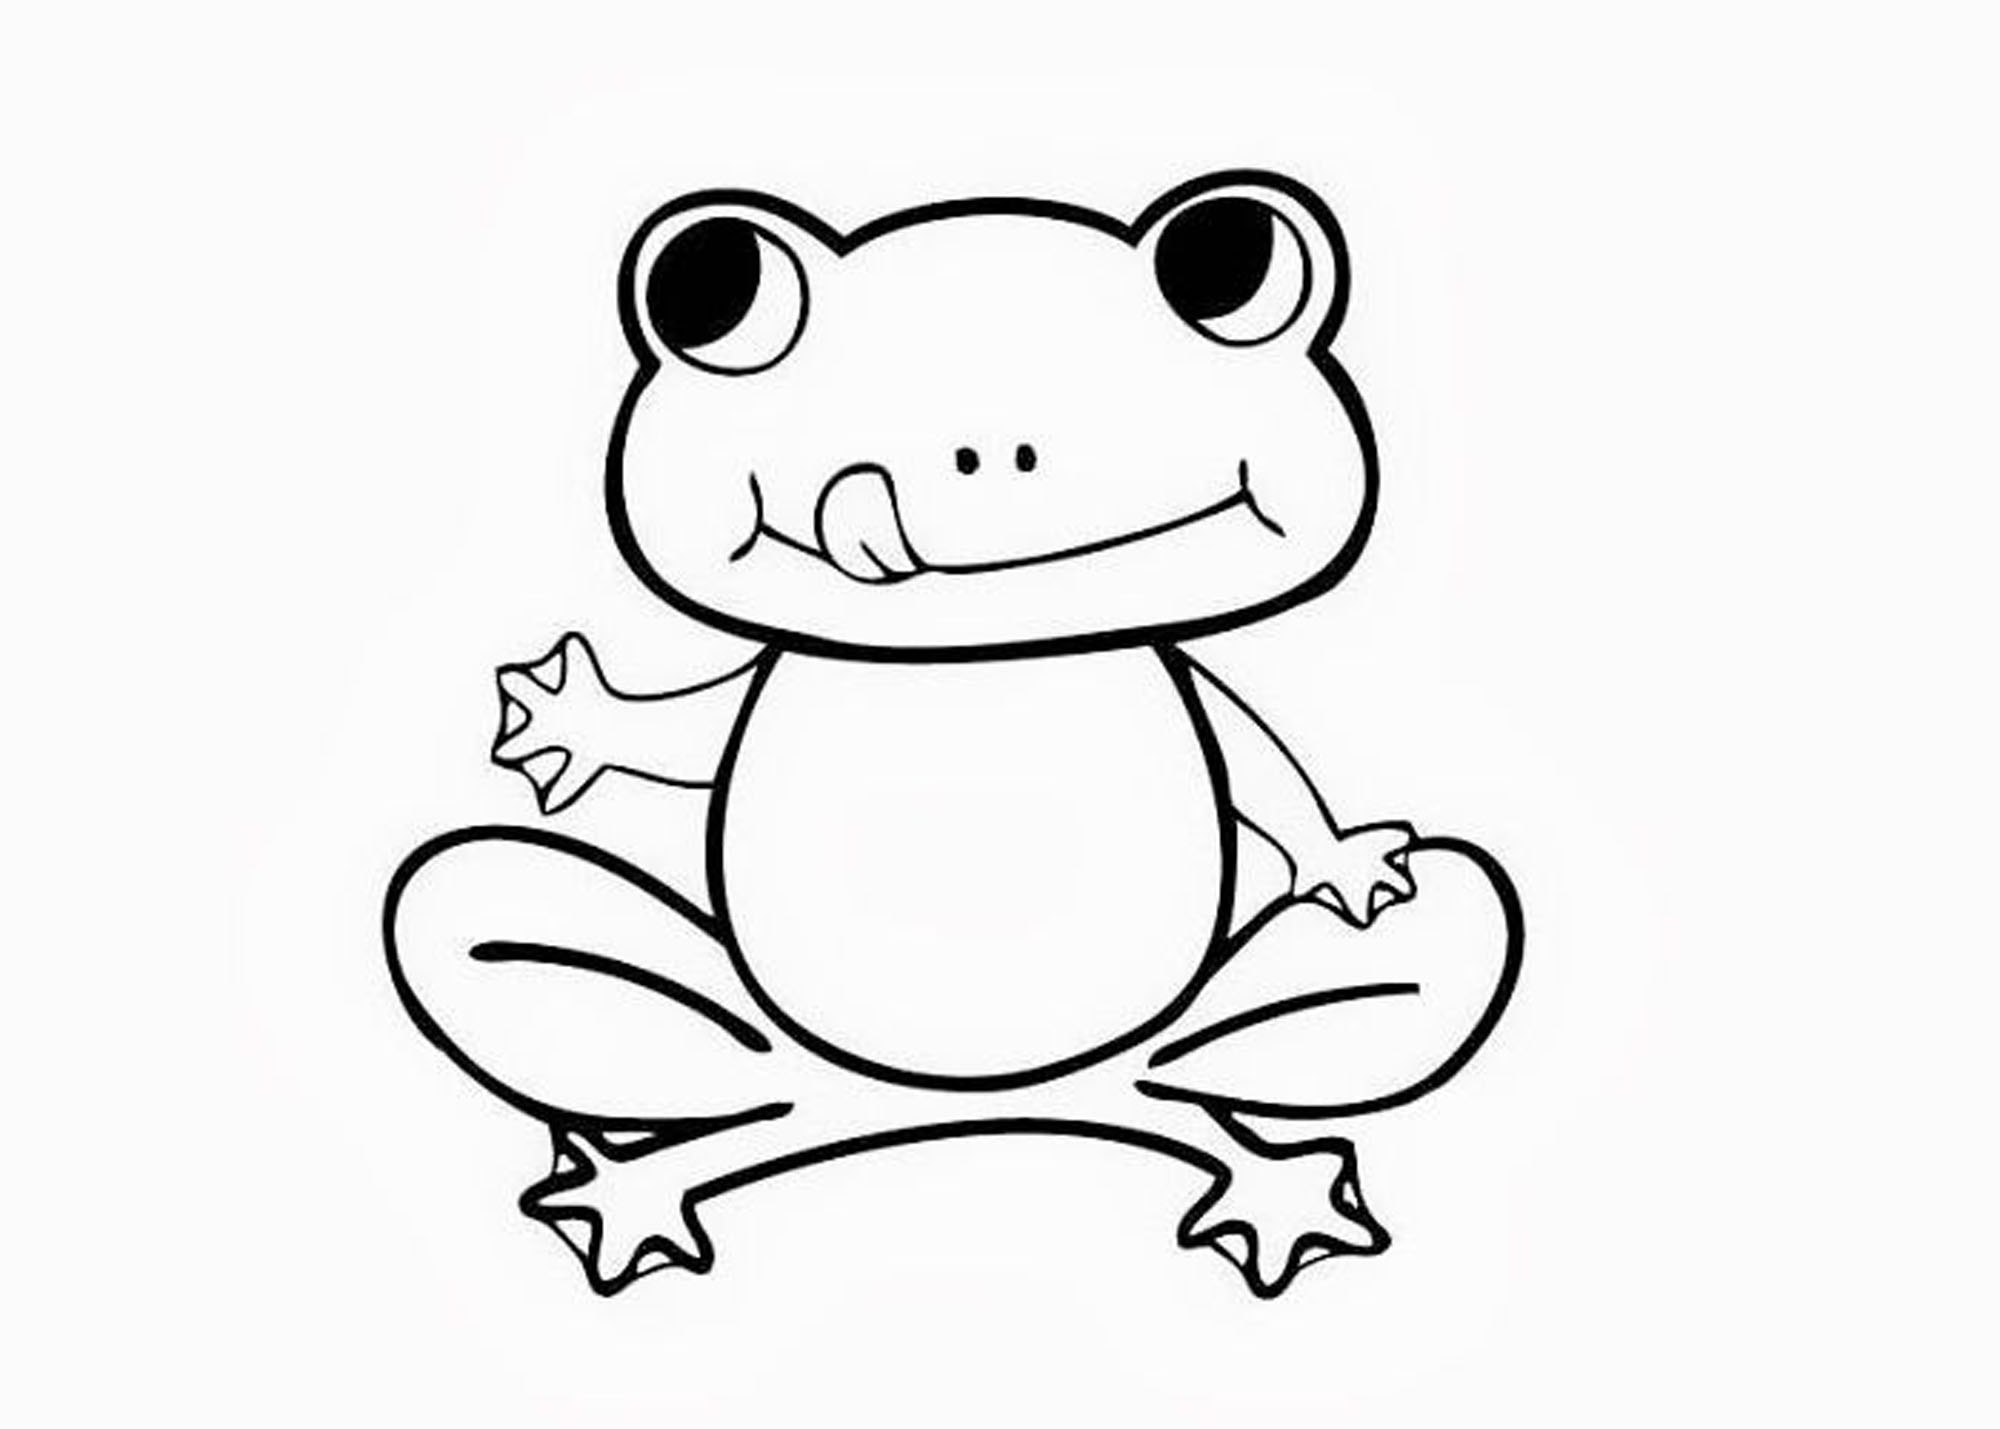 2000x1429 Kermit The Frog Printable Free Download